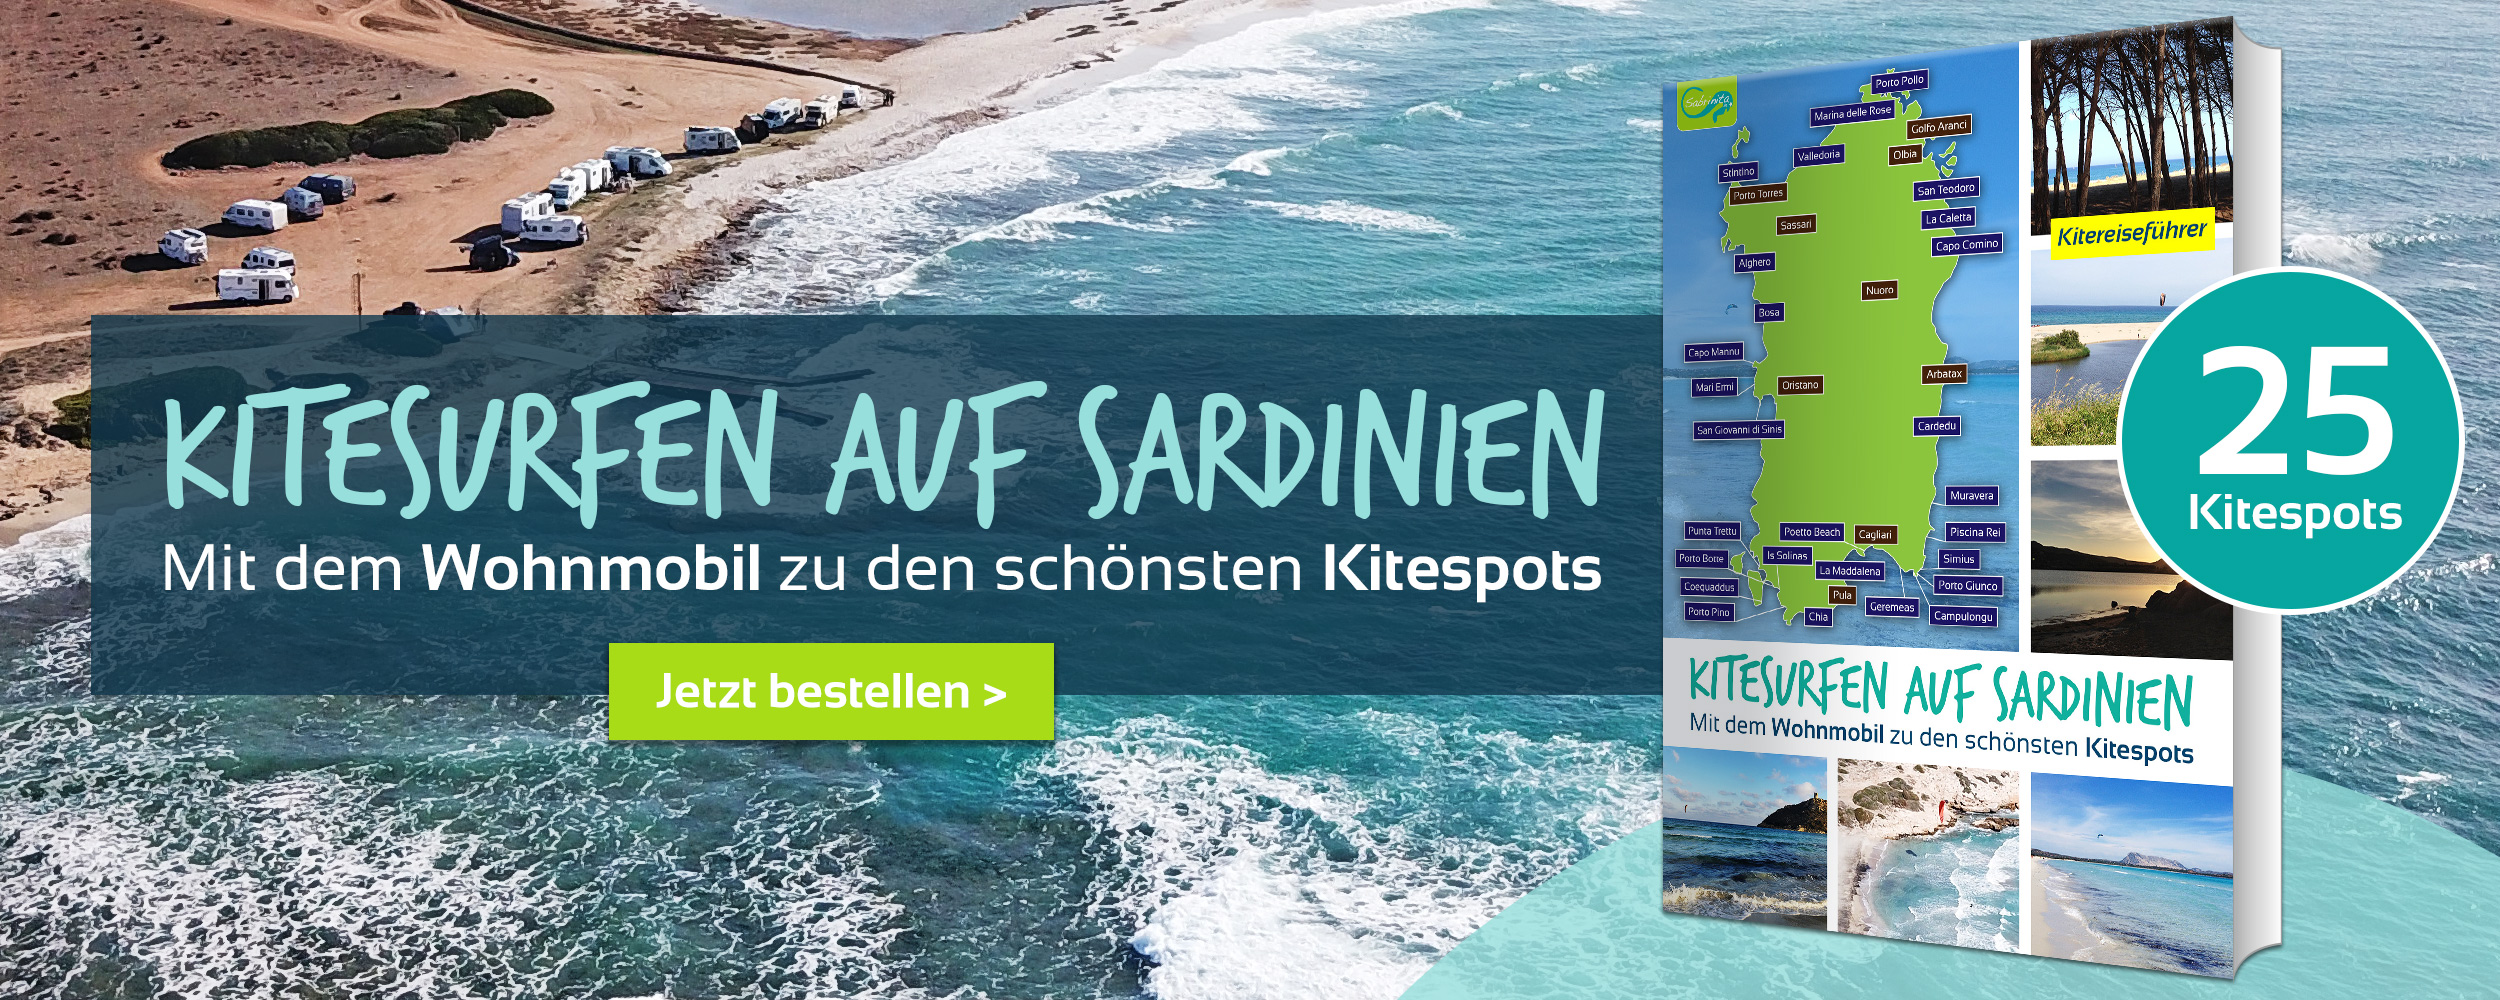 Kitesurfen auf Sardinien - Kitereiseguide